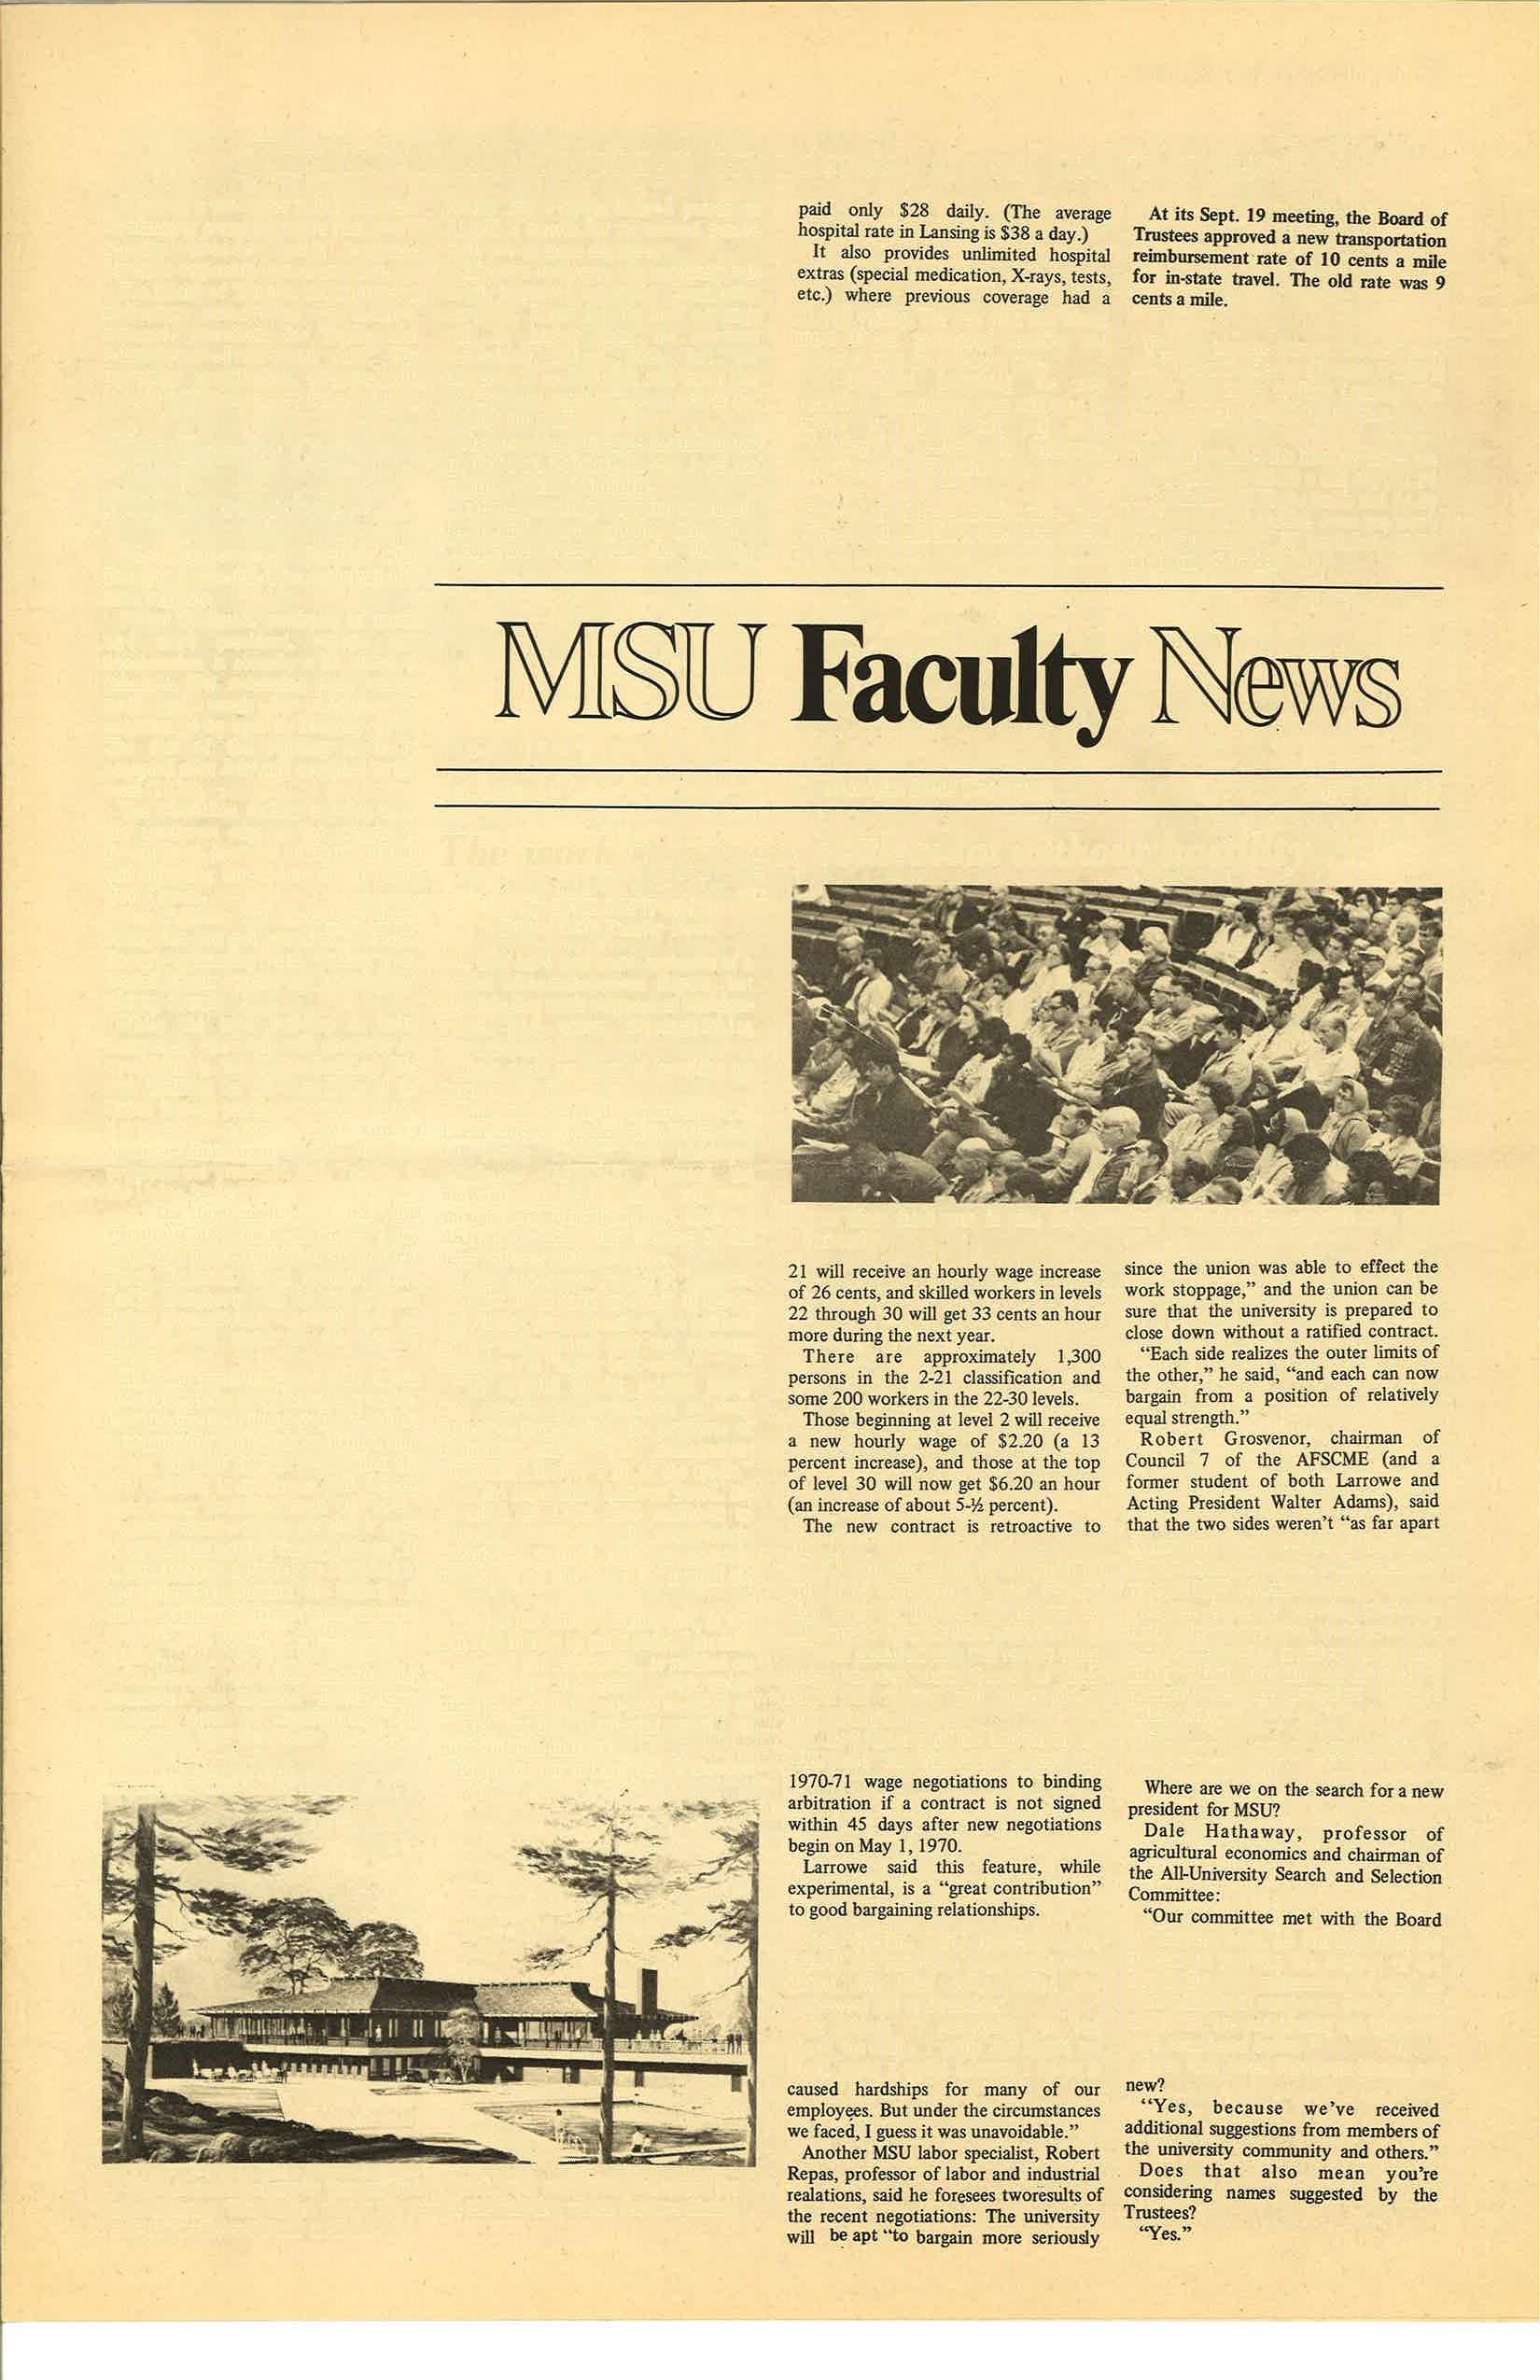 MSU News Bulletin, Vol. 1, No. 10, December 2, 1969